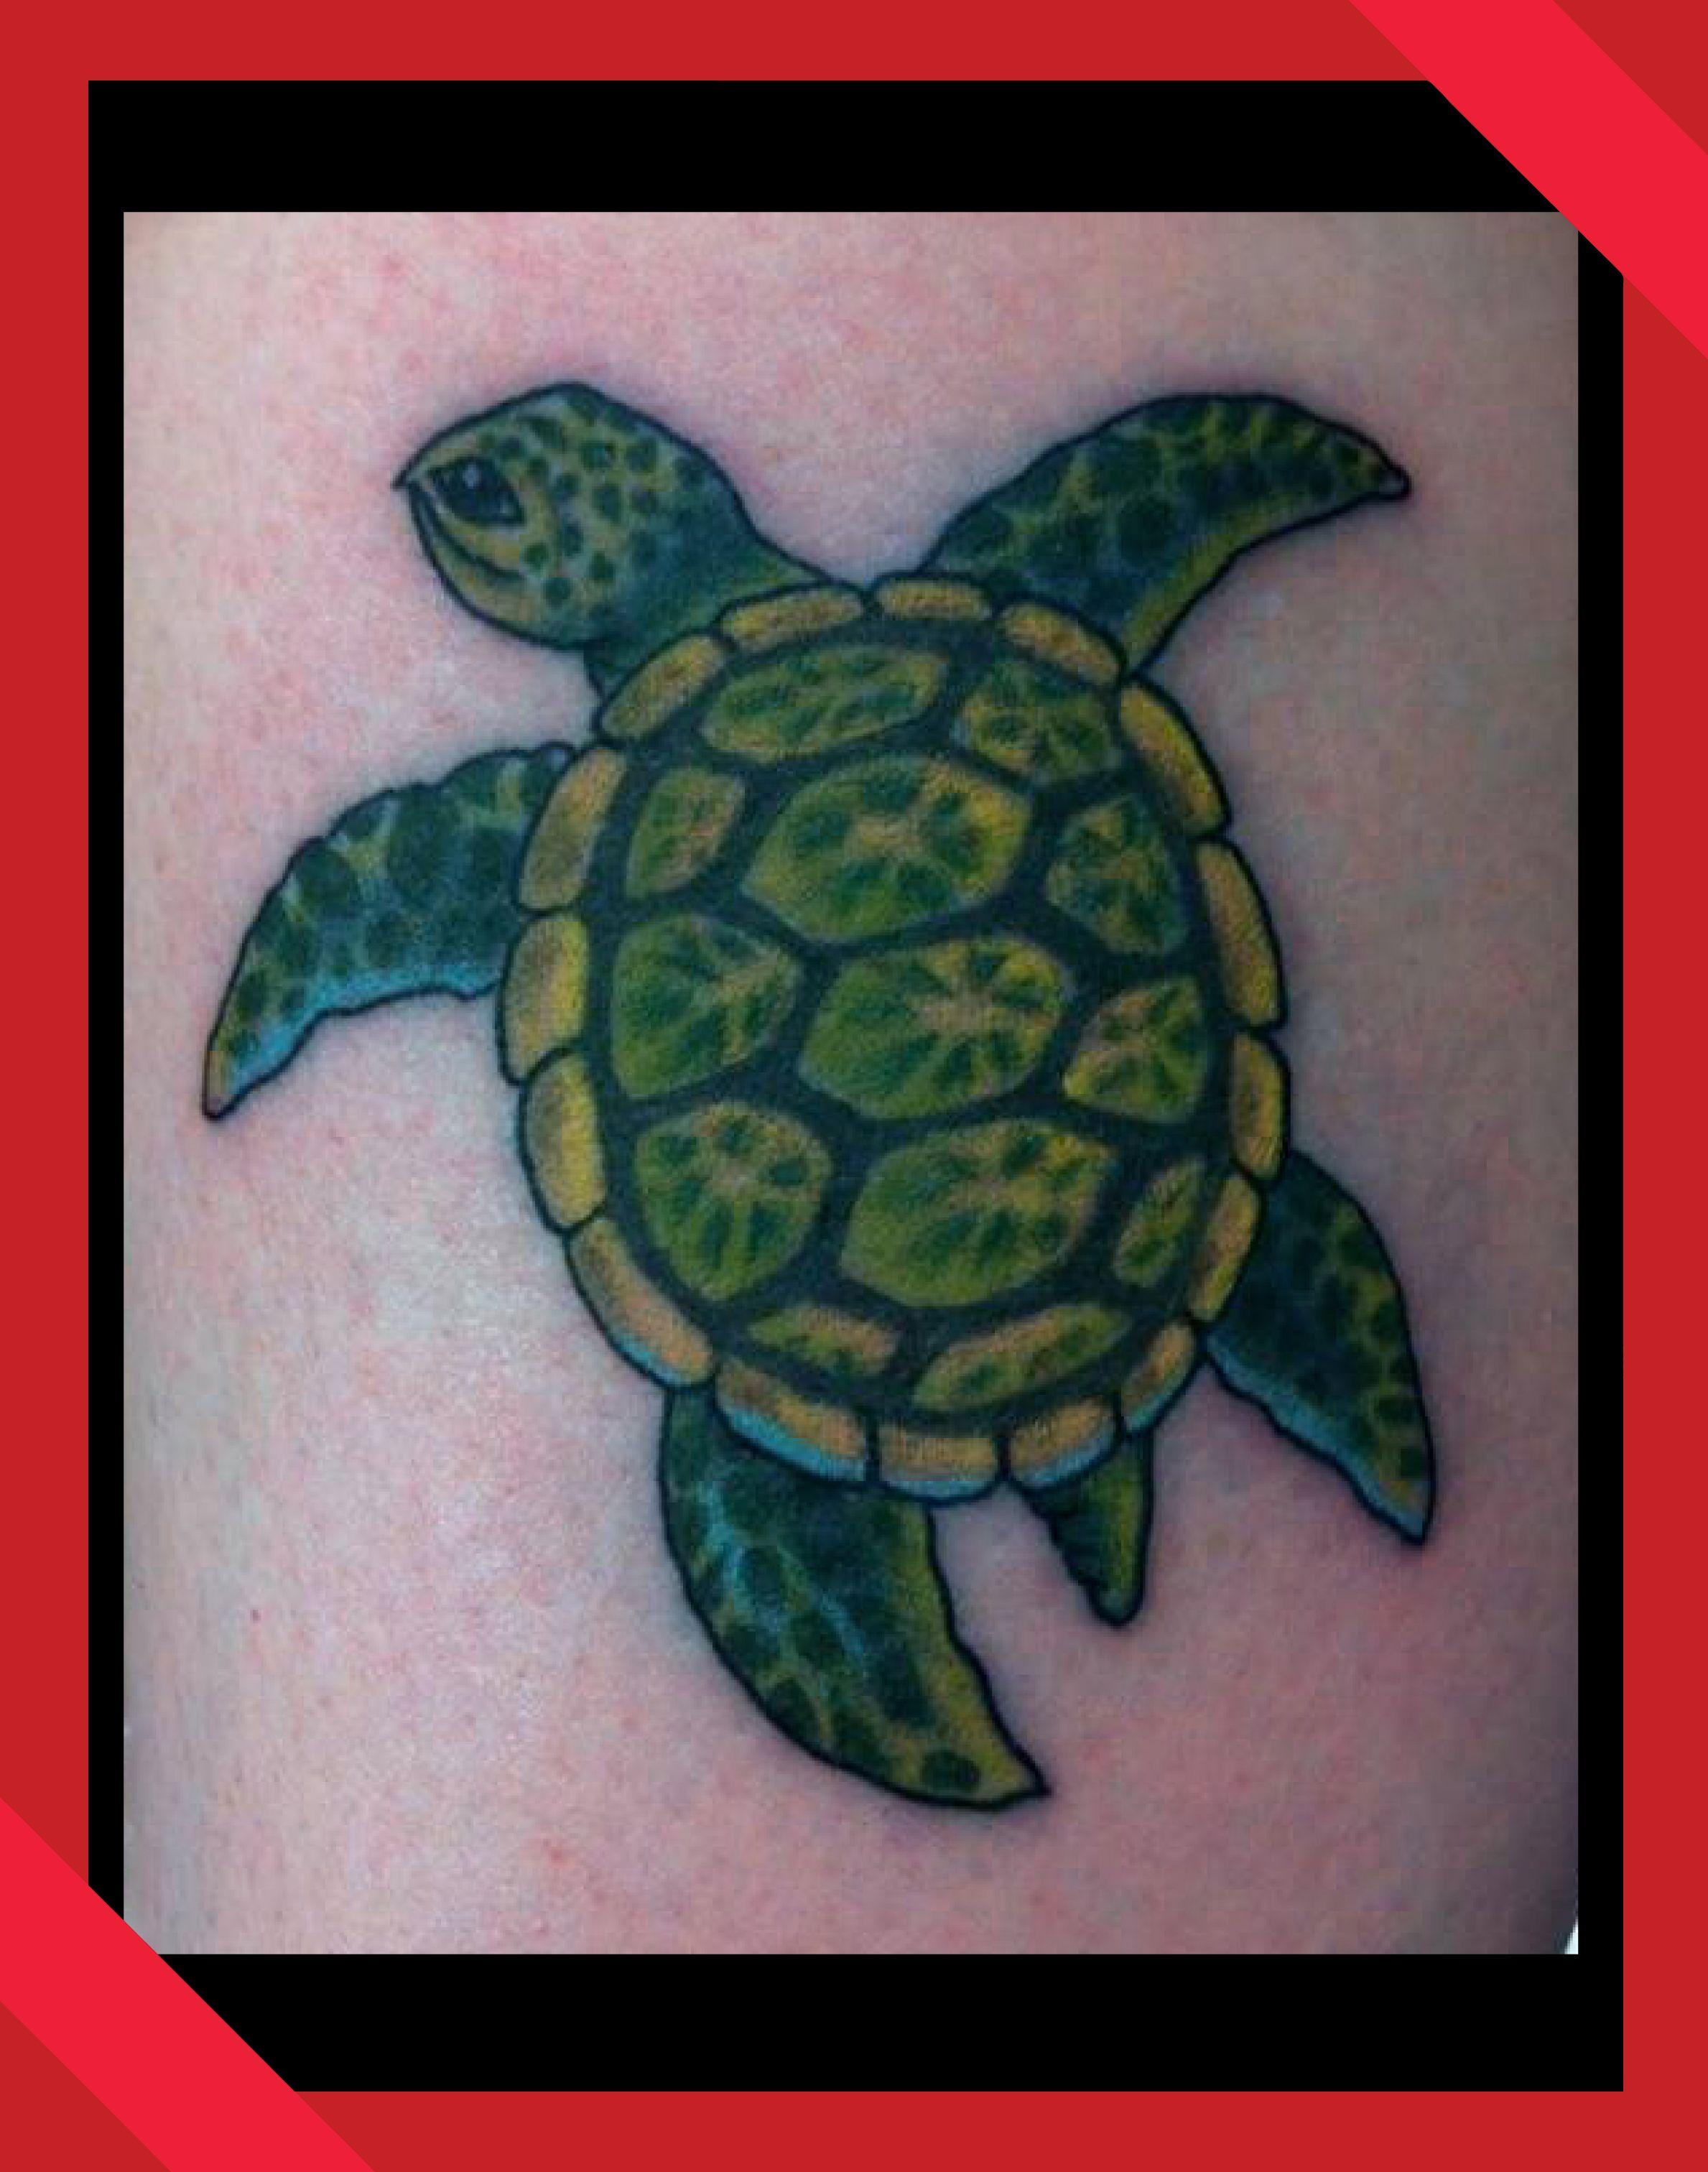 Hawaiian sea turtle tattoo by Anthony Hunter | Tattoos ...